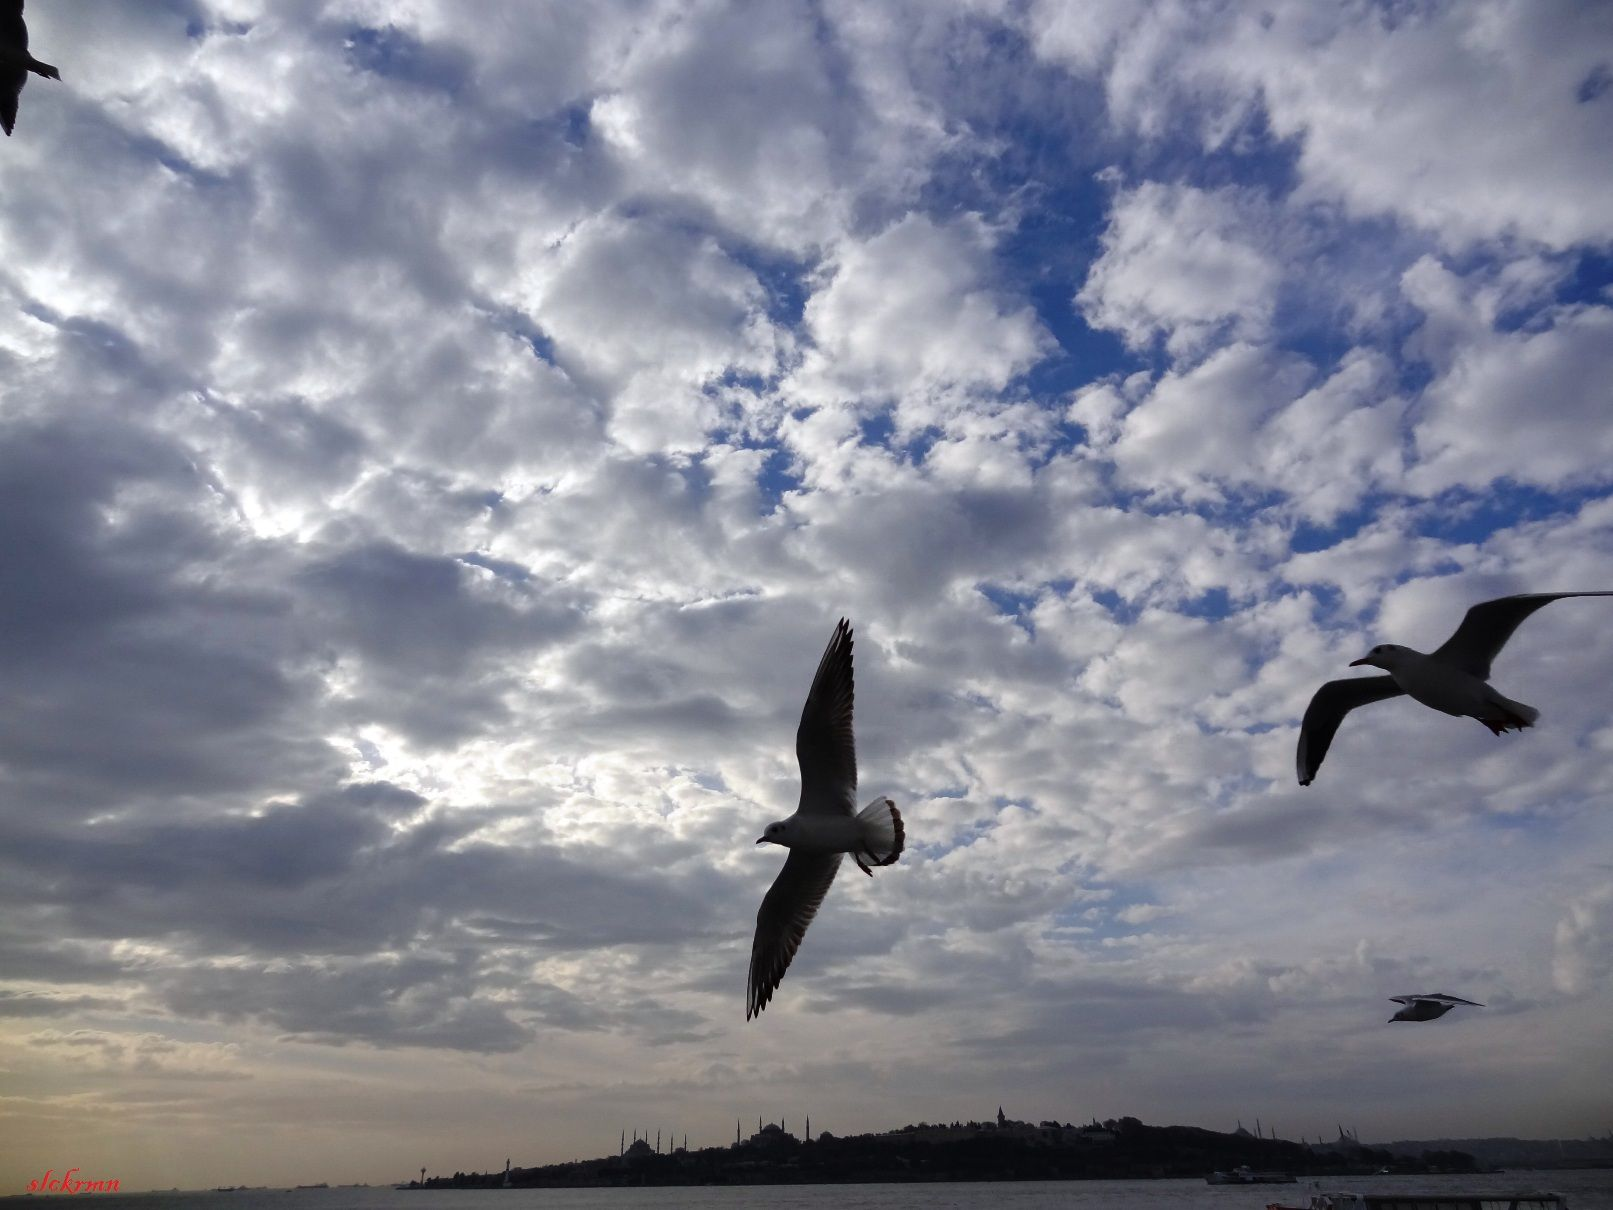 istanbul by sony DSC-Hx9v slckrmn